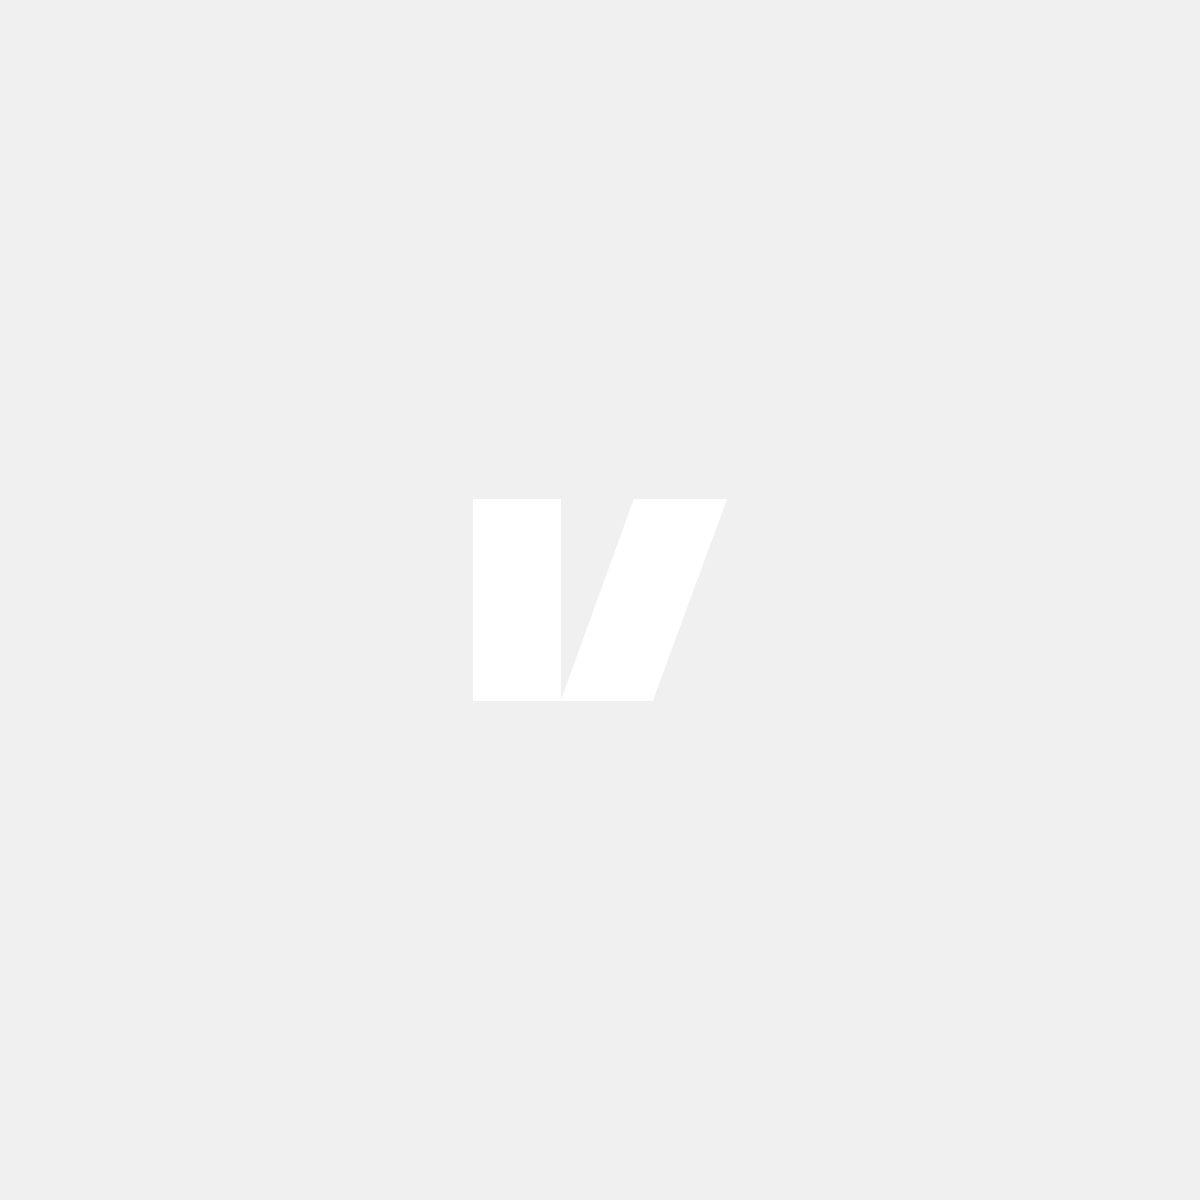 Bagagerumsmatta till Volvo XC60 09-, svart plast